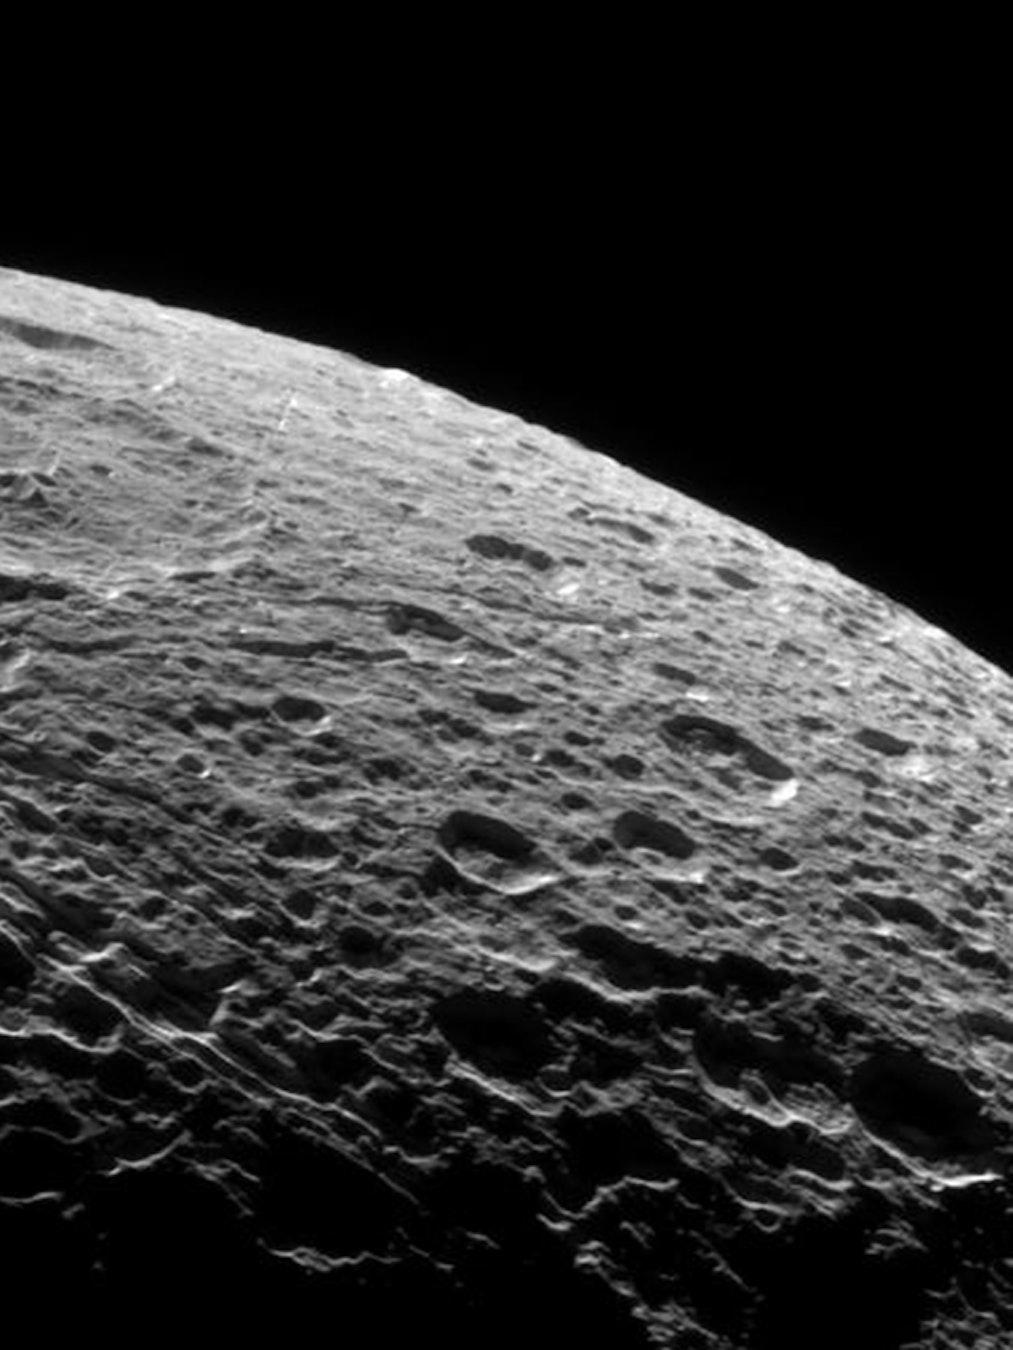 dione saturn moon